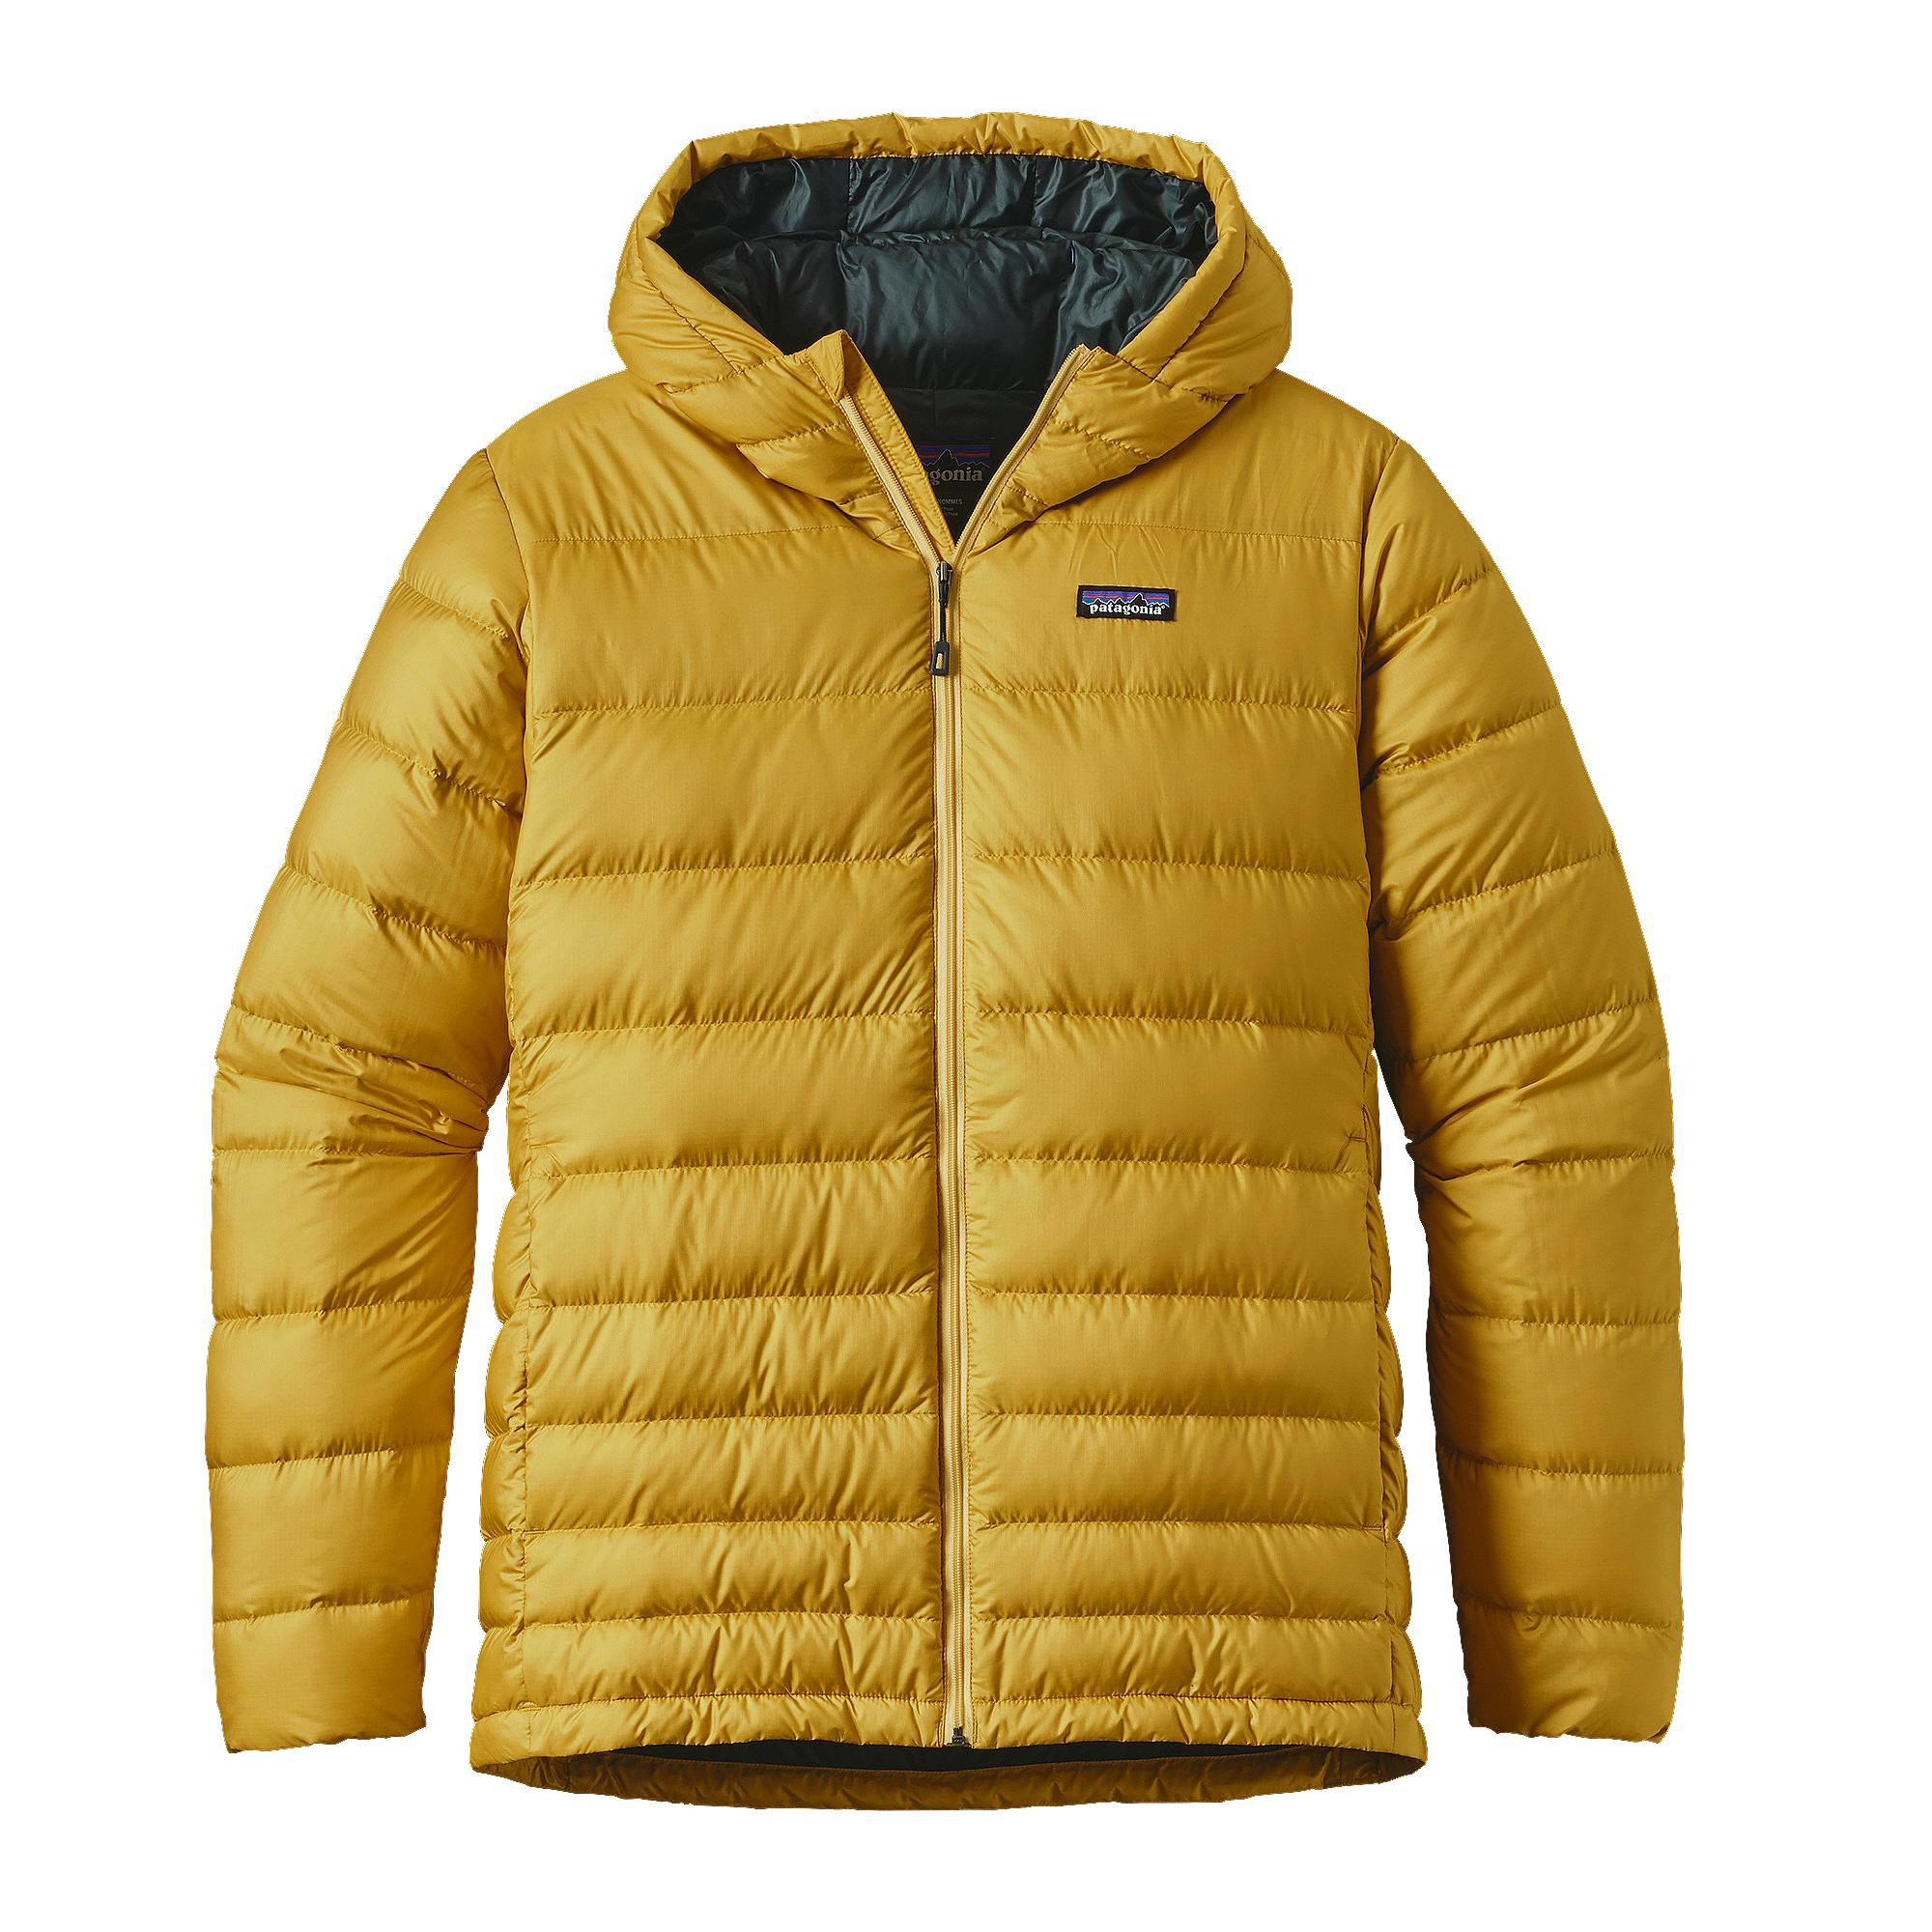 Buy Patagonia Women's Nano Puff Jacket online | Bergzeit